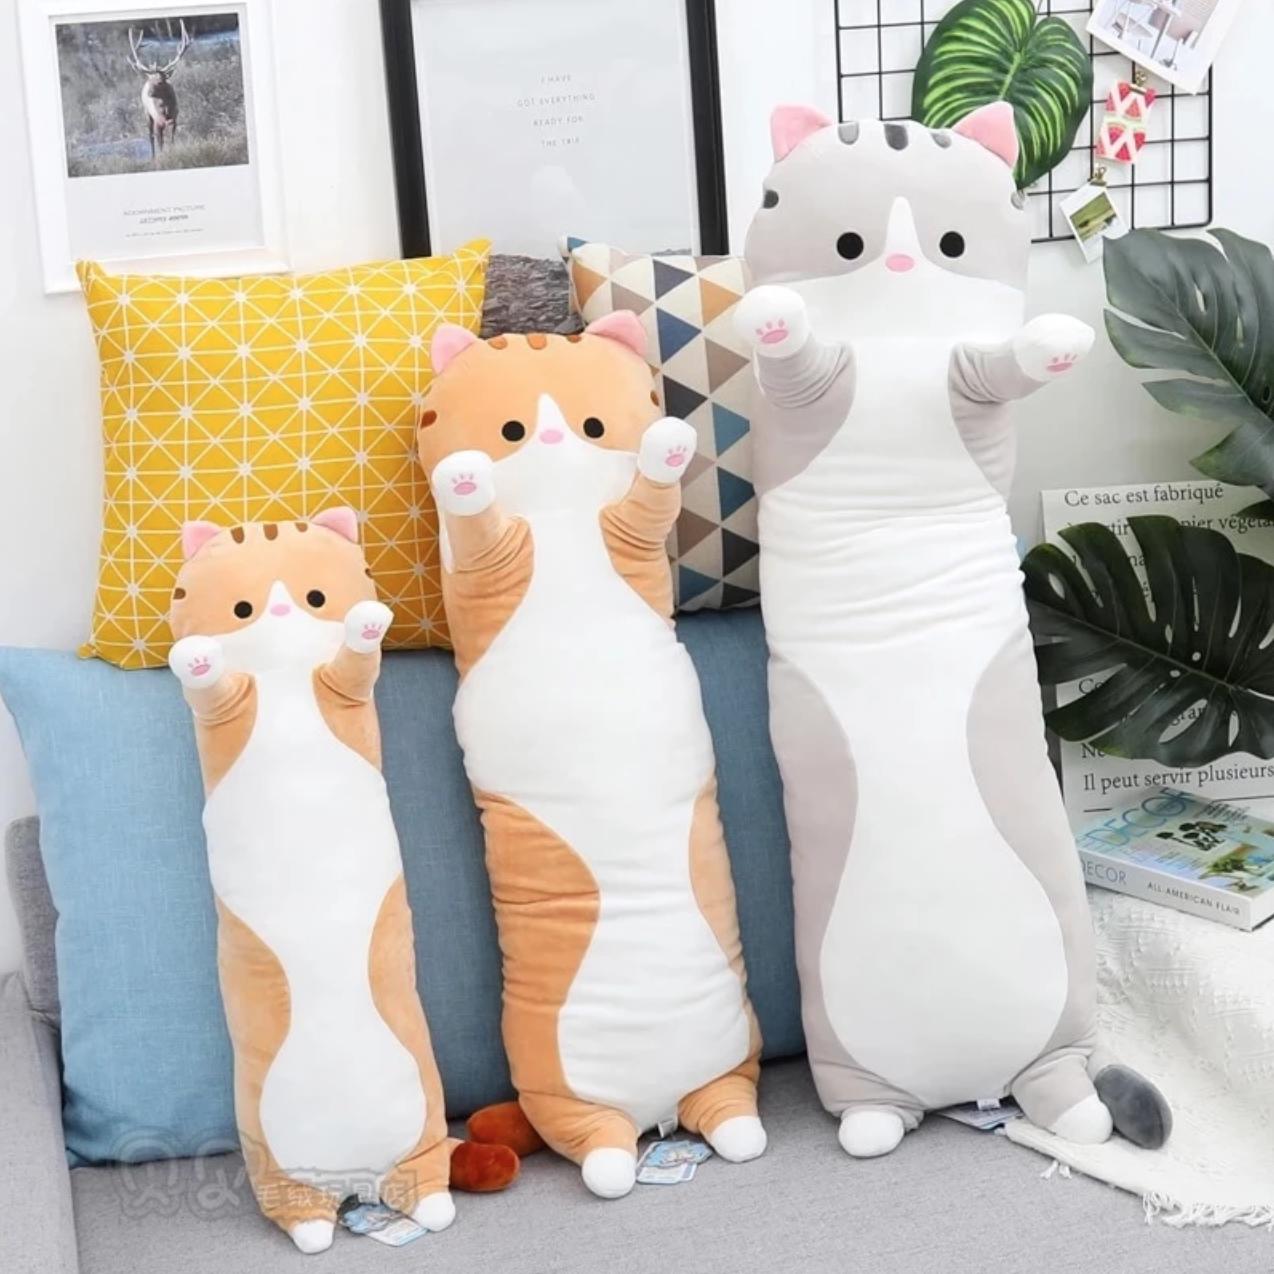 - Kawaii Stationery amp Plush Shop - Kawaii Stationery amp Plush Shop Our Stand Up Long Cat Soft Stuf